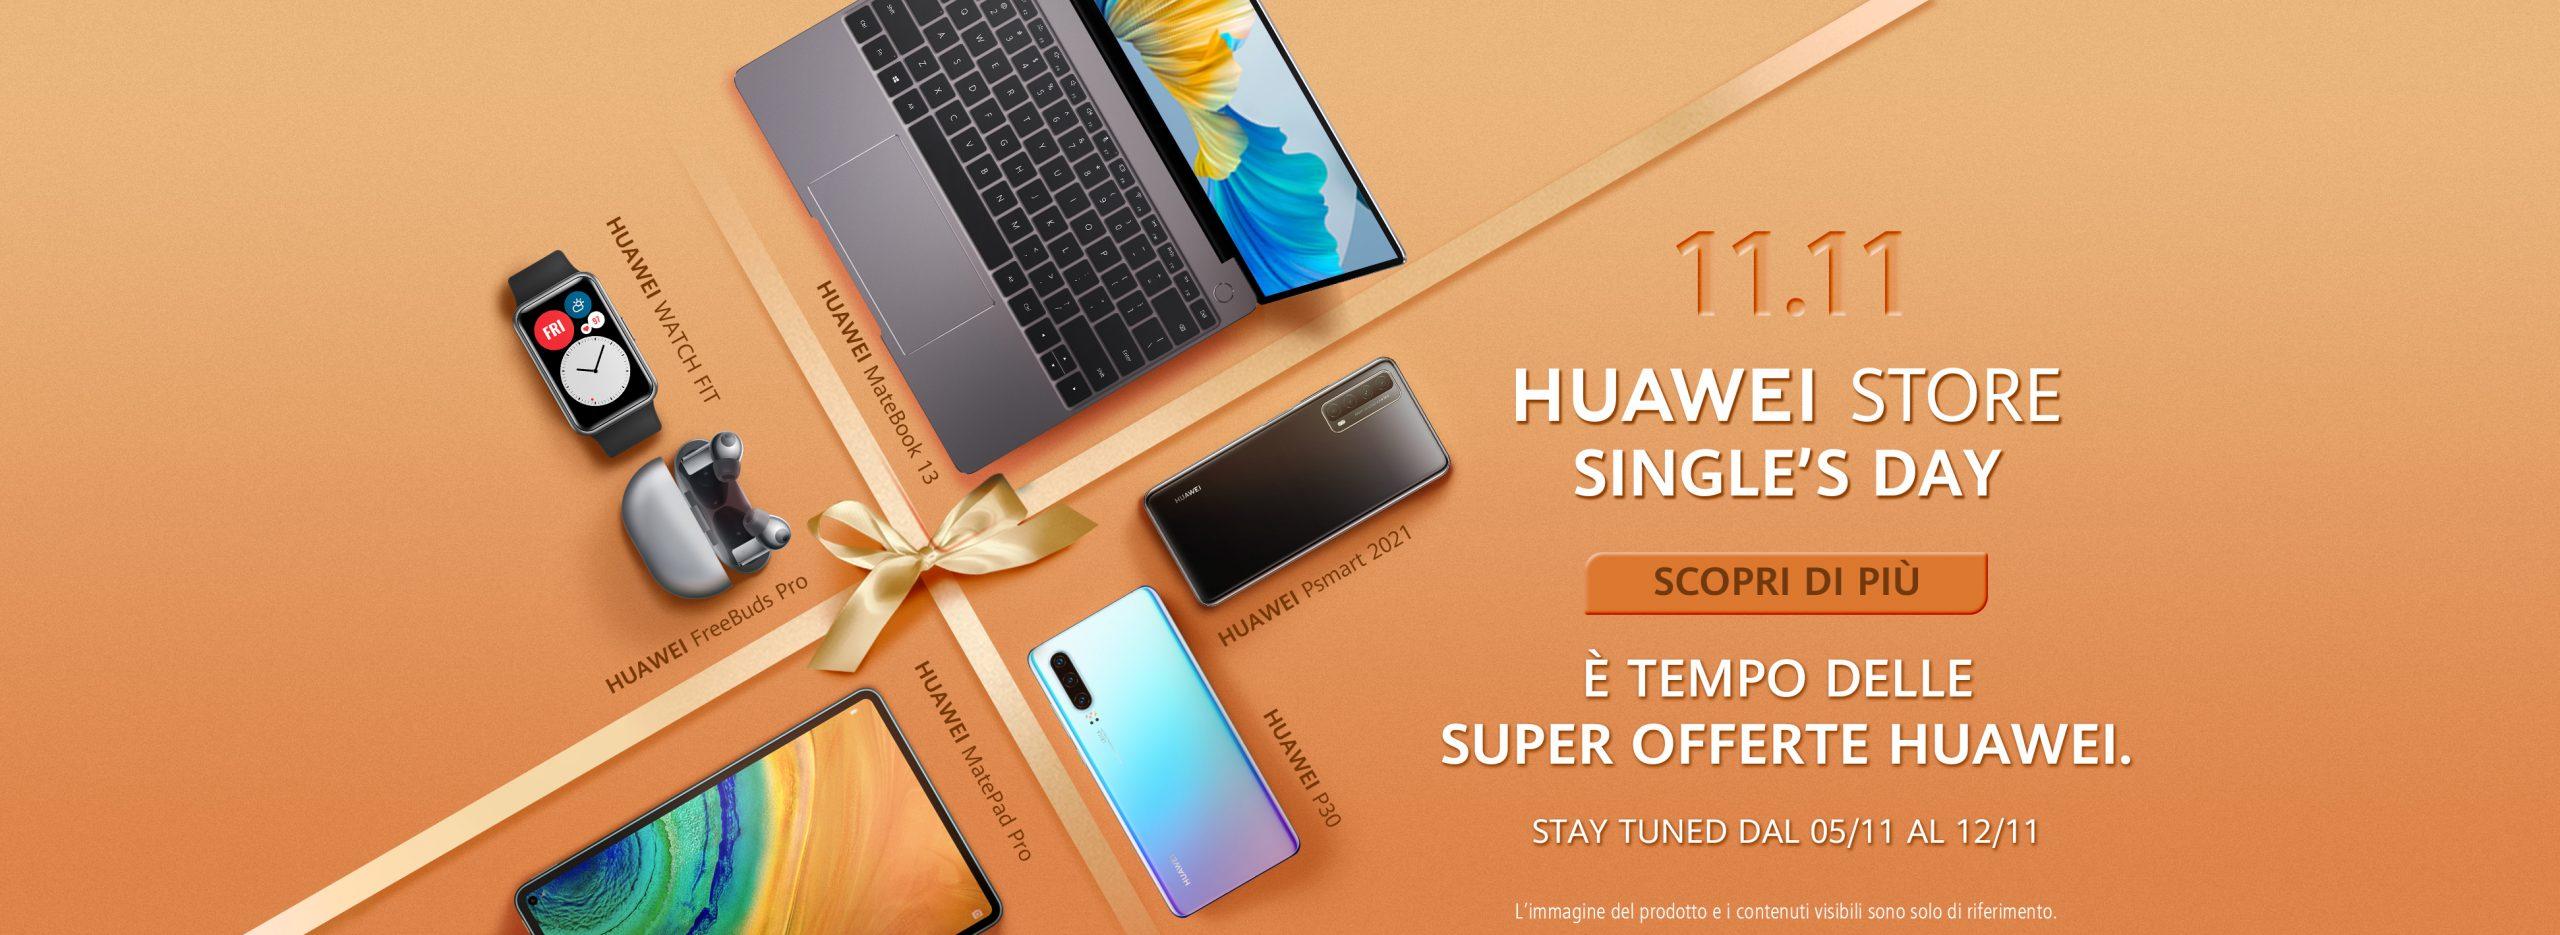 Huawei Singles's Day